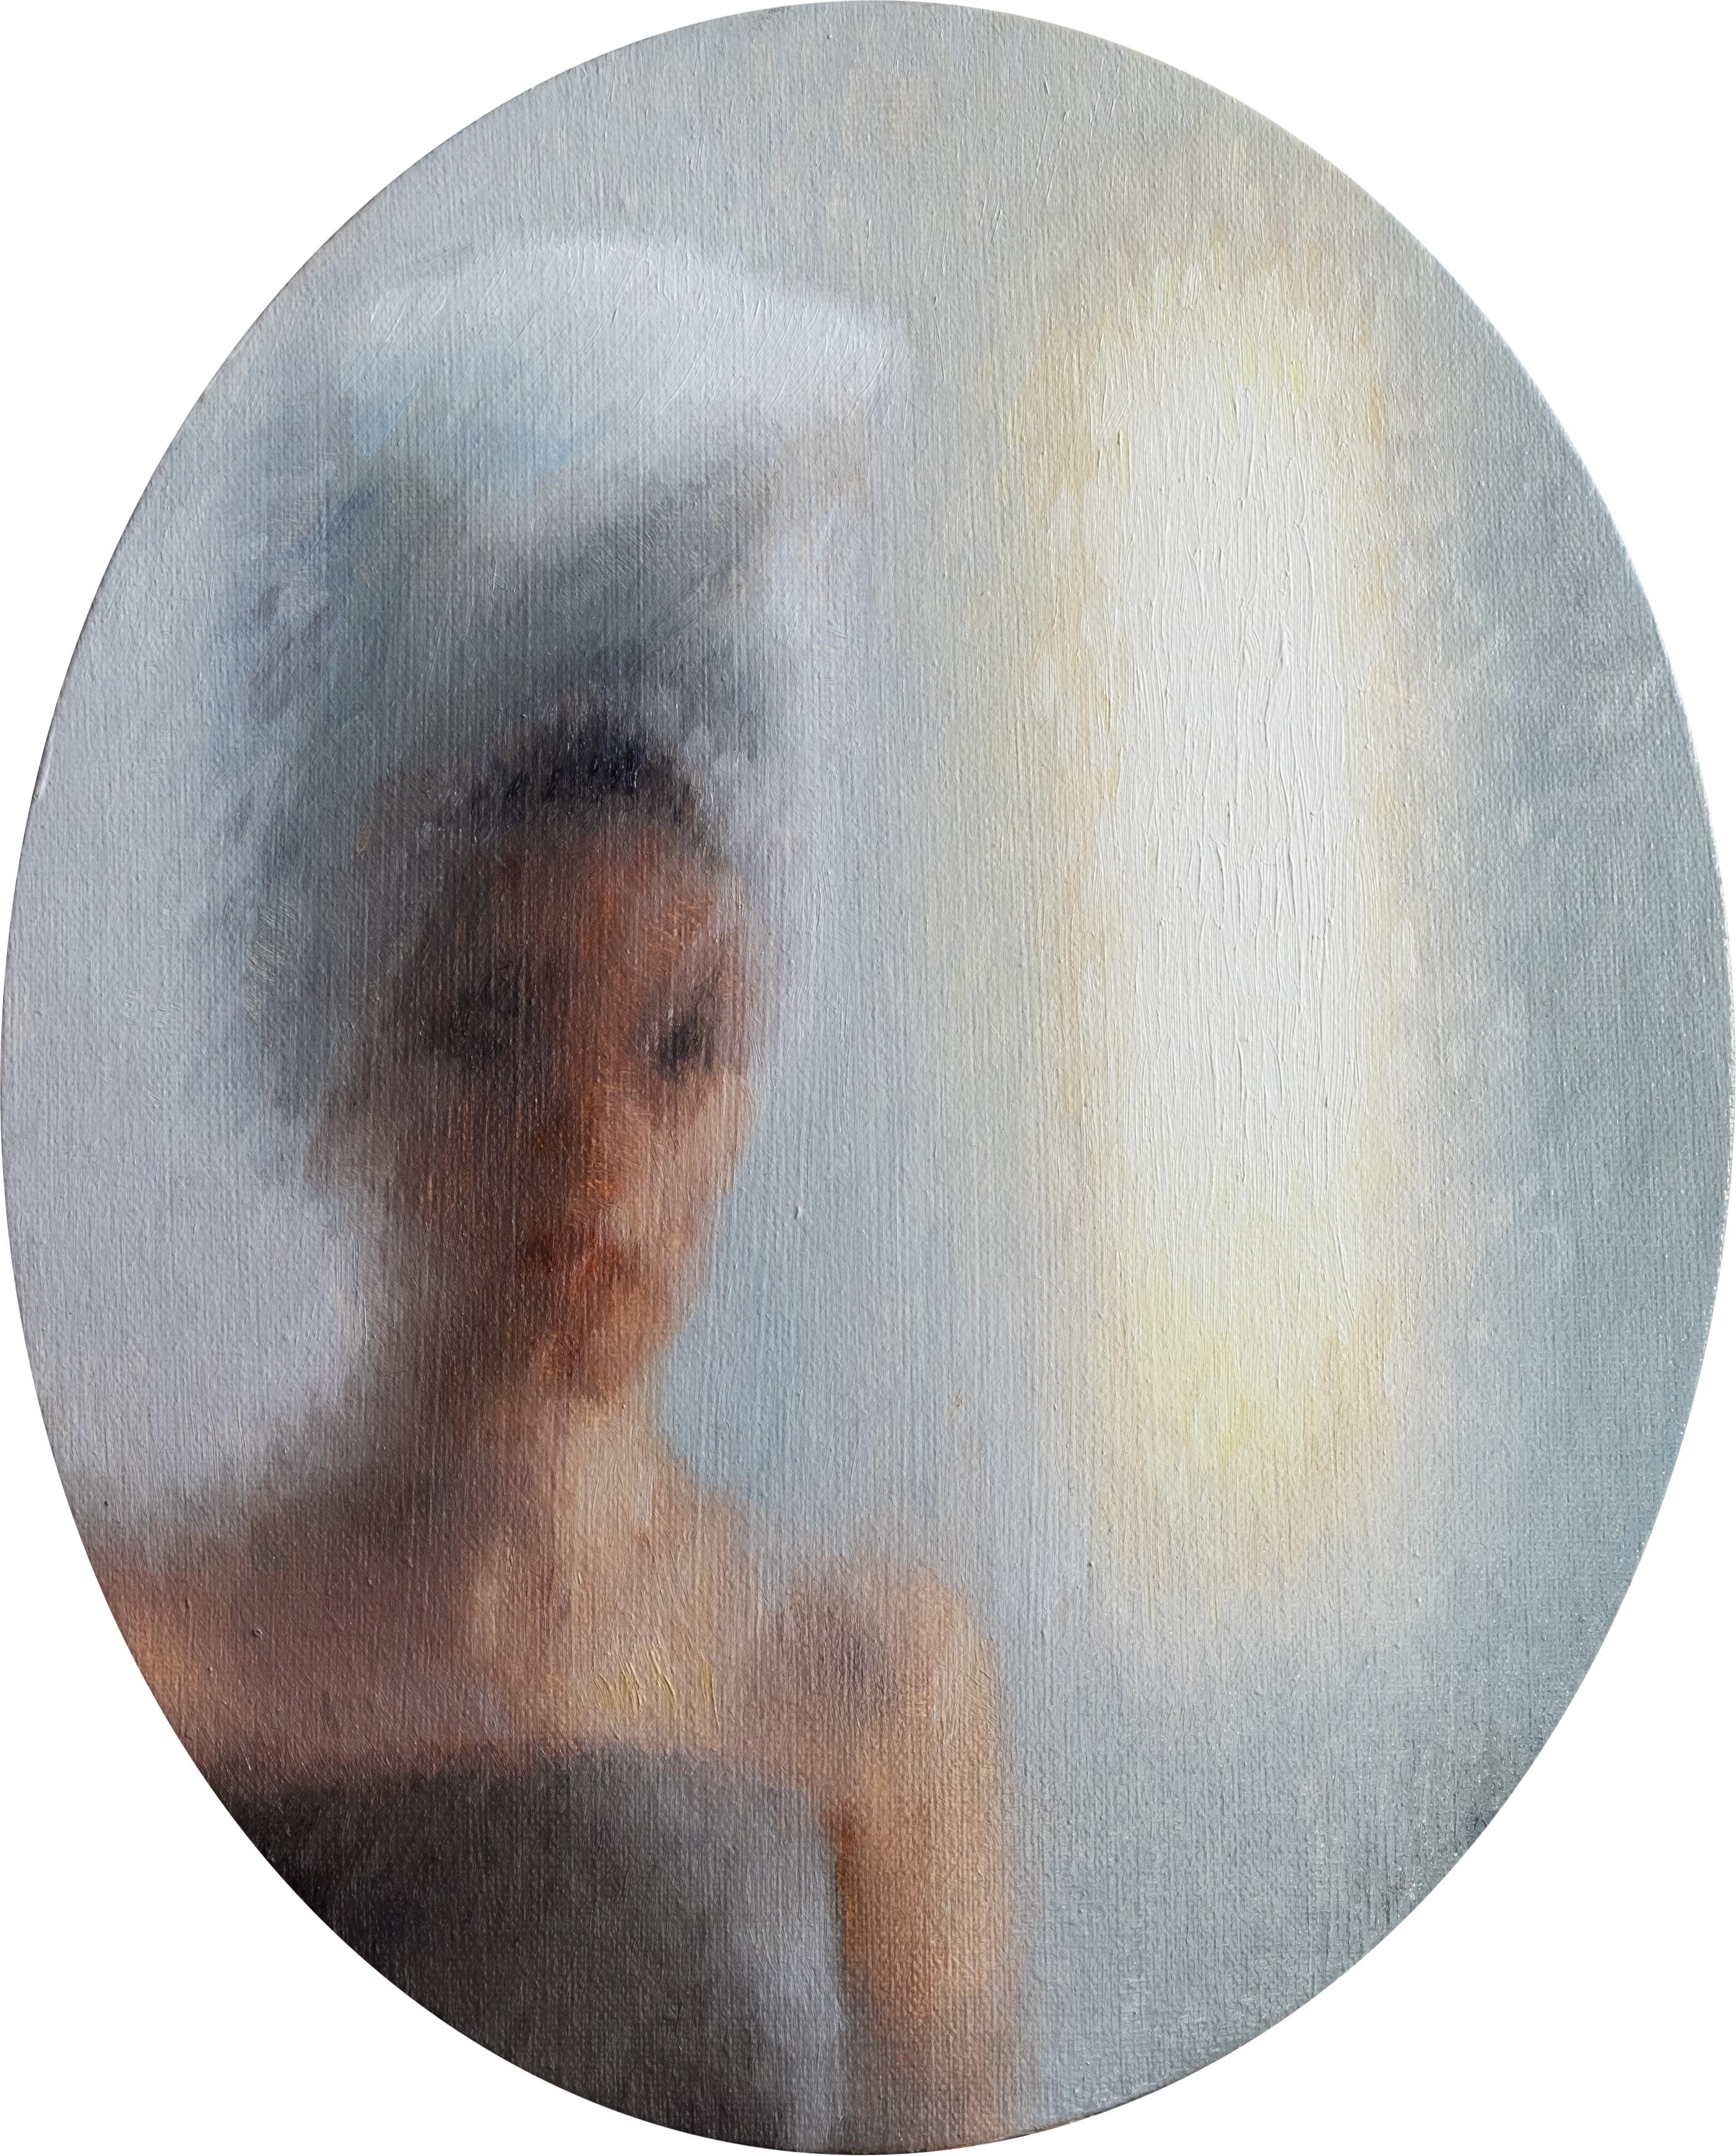 Anna Calleja, Reflection in Mirror, oil on canvas, 20x25cm, 2020